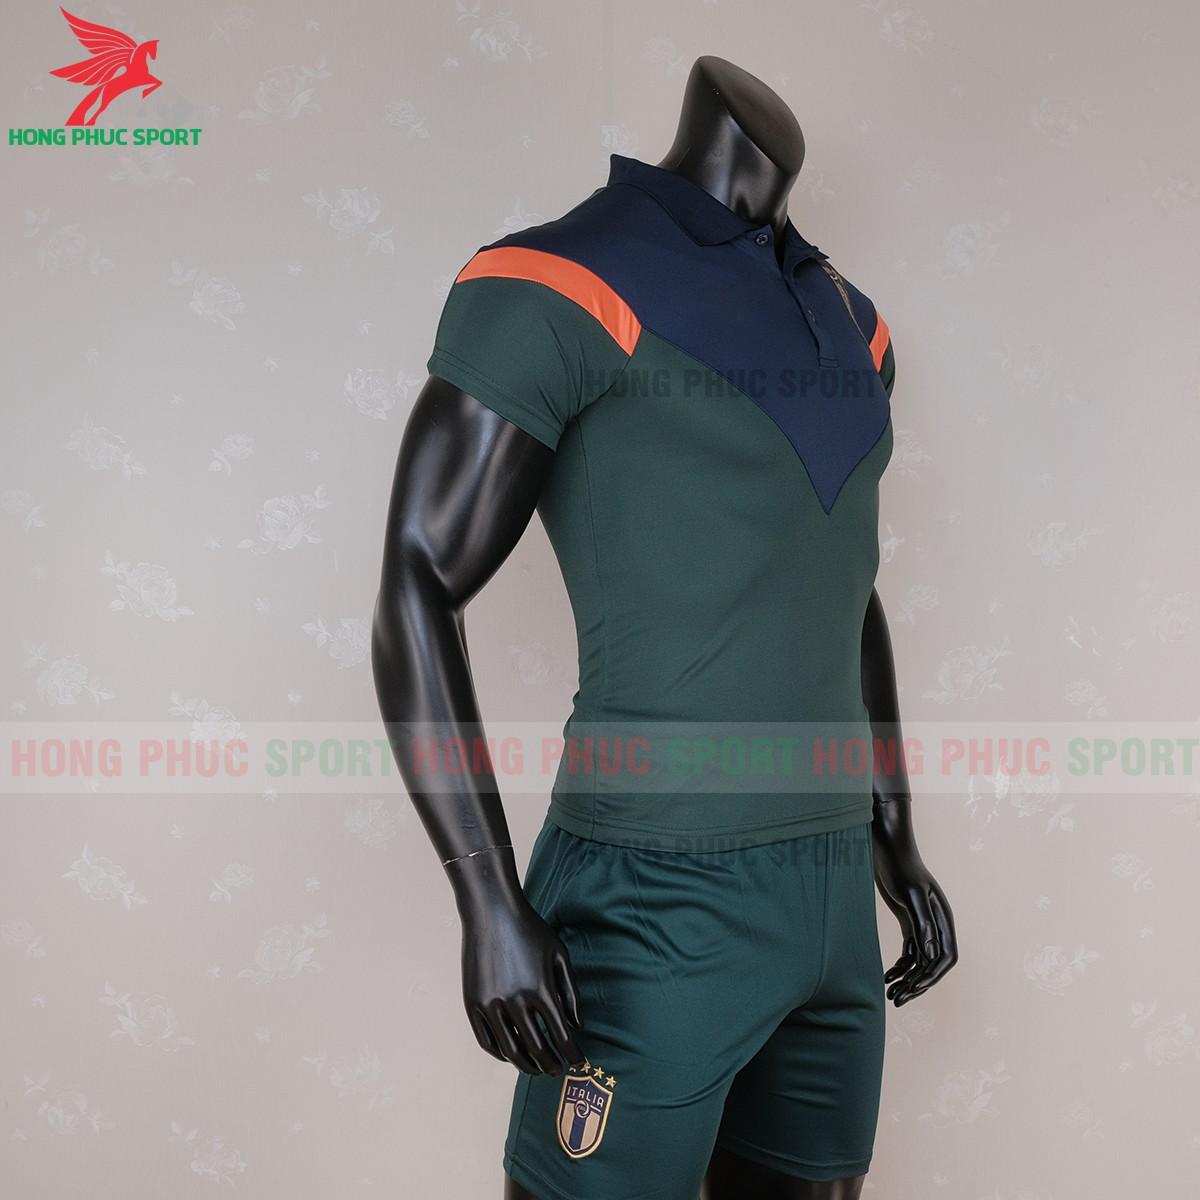 https://cdn.hongphucsport.com/unsafe/s4.shopbay.vn/files/285/ao-polo-tuyen-italia-2020-5-5f73e3b9ccec6.png